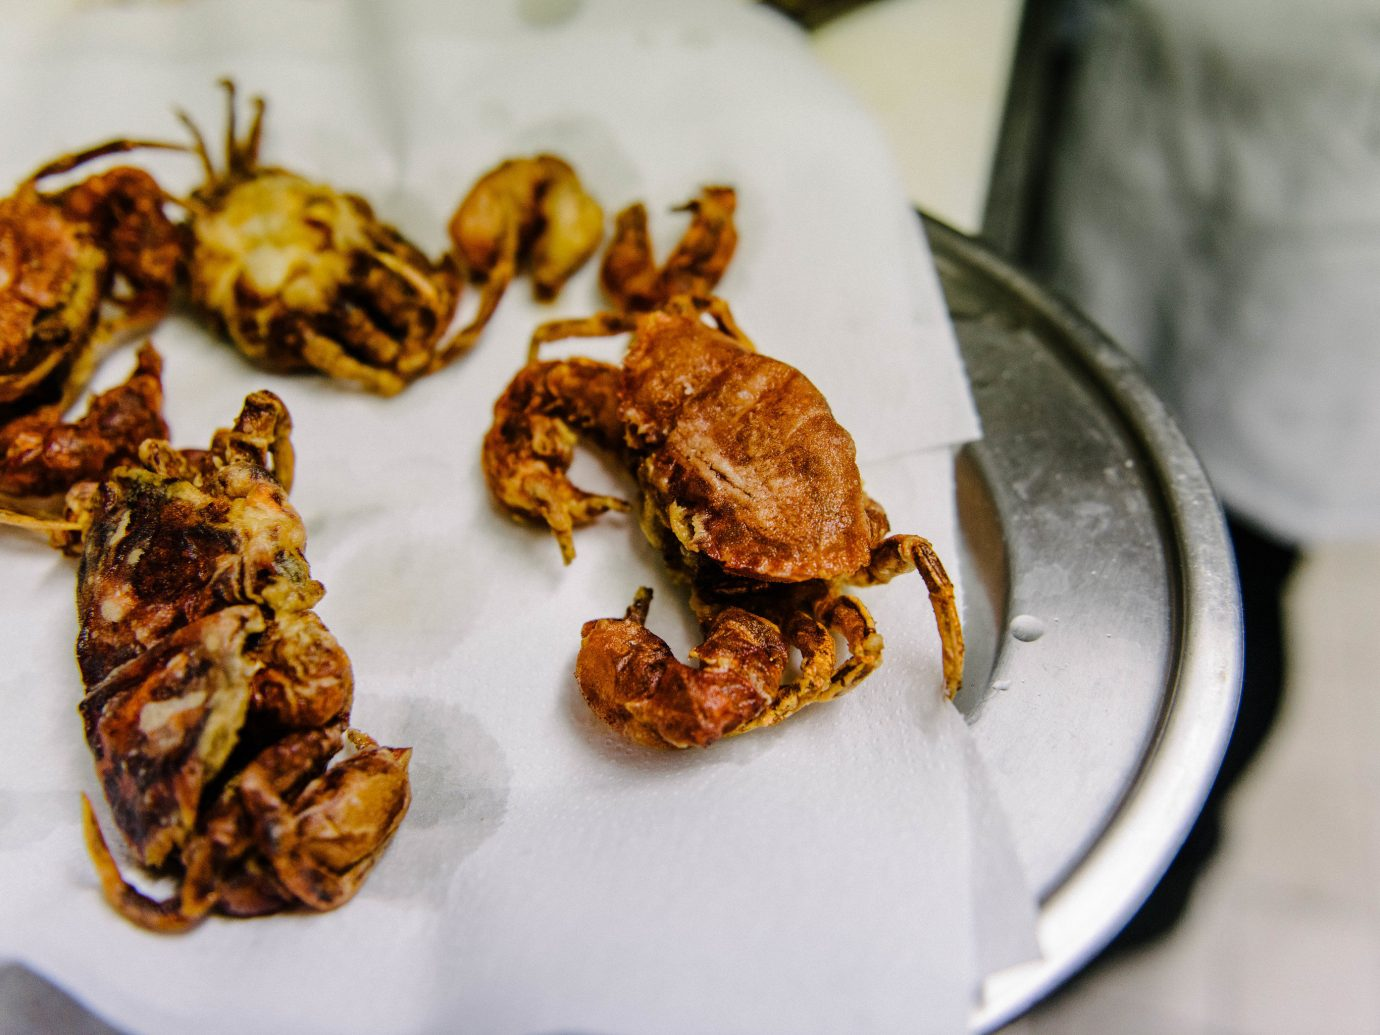 Trip Ideas plate dish food fried food Seafood animal source foods cuisine recipe sliced